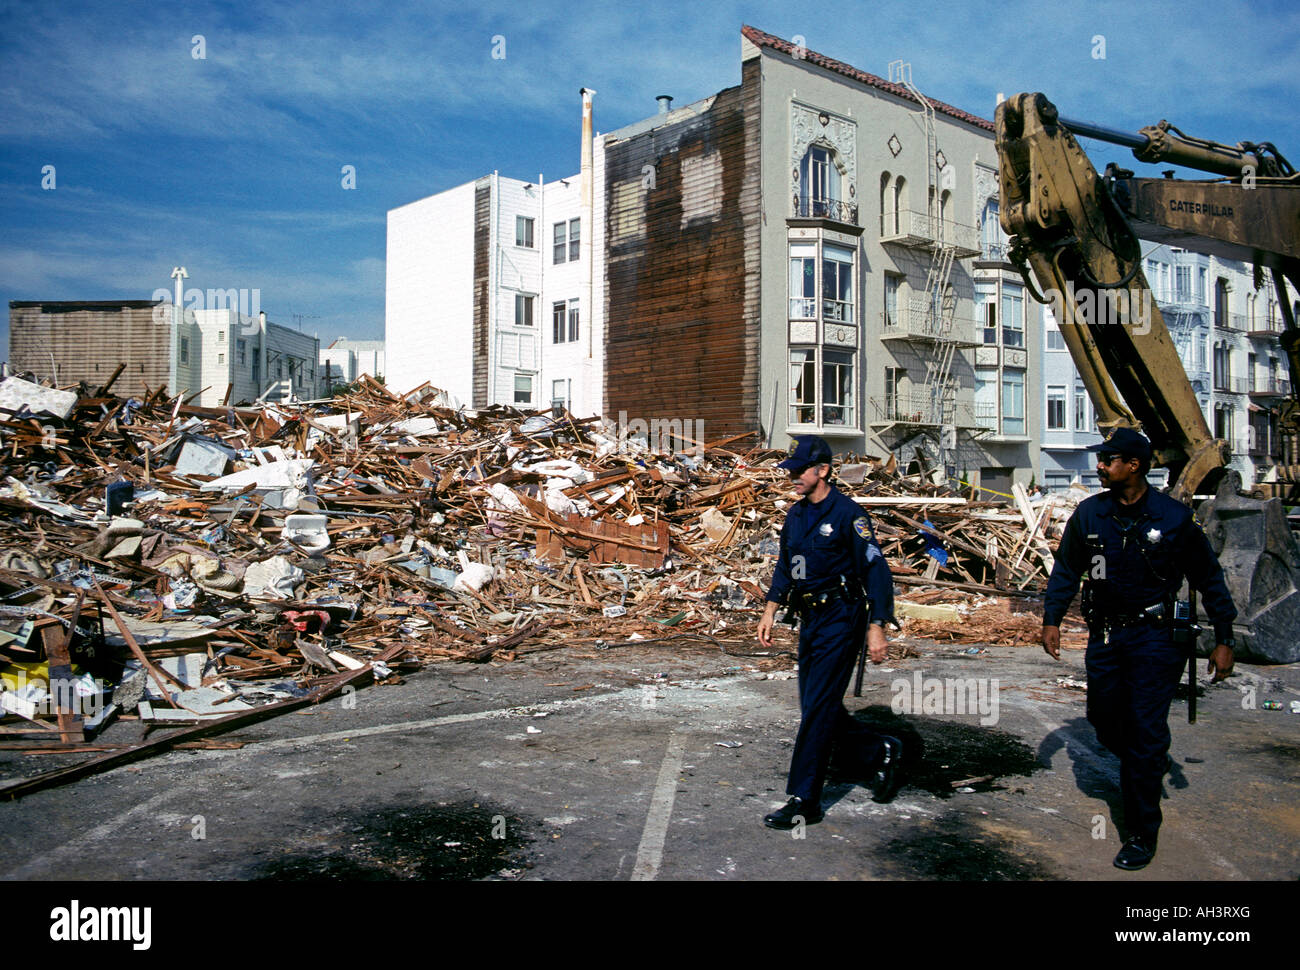 17 Oktober 1989 Loma Prieta Erdbeben Loma Prieta Erdbeben